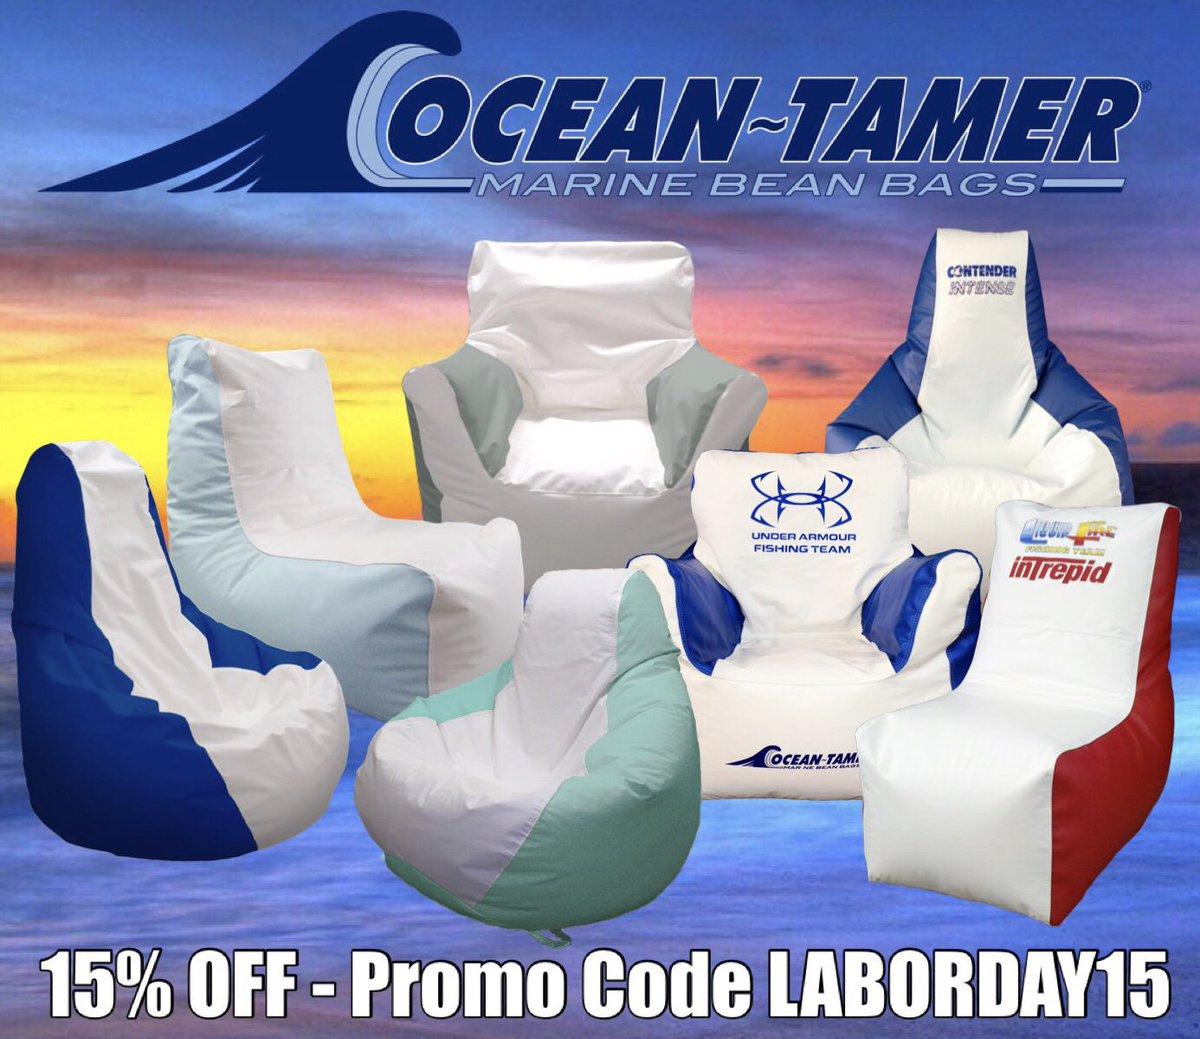 Superb Medie Tweets Af Ocean Tamer Oceantamer Twitter Inzonedesignstudio Interior Chair Design Inzonedesignstudiocom